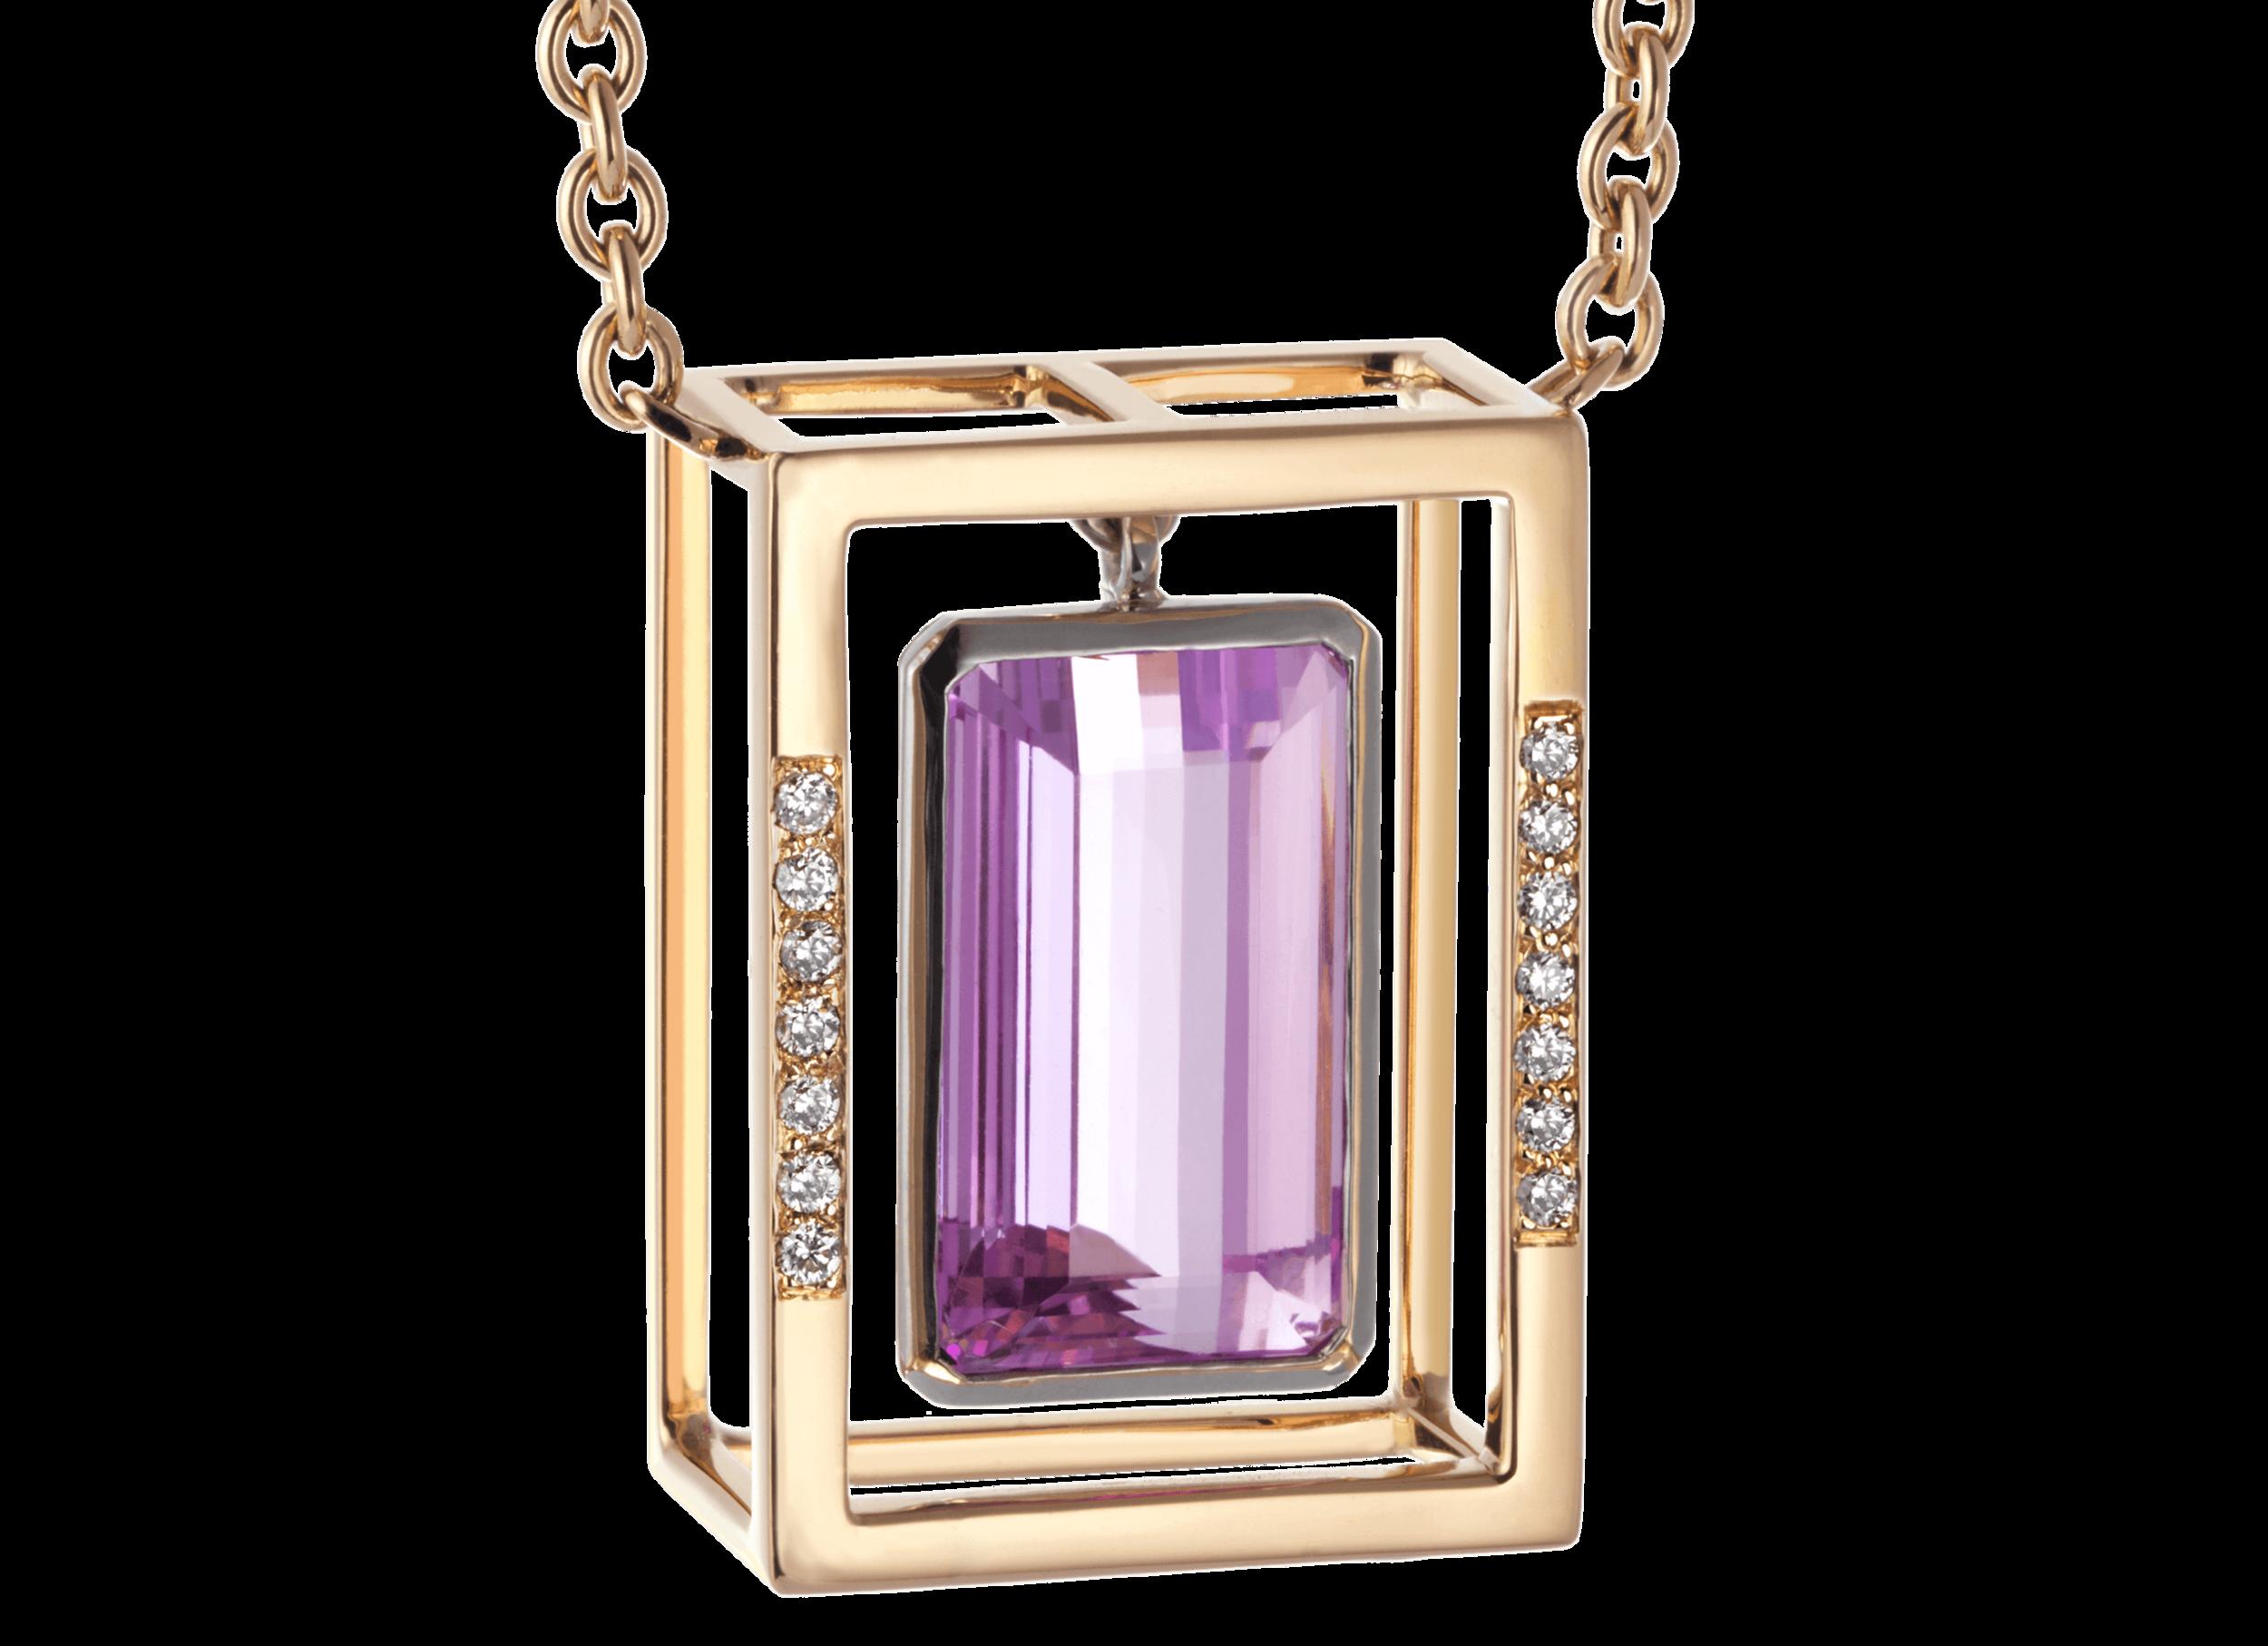 Pendentif Stoa - Topaze rose 13,88 carats et diamants